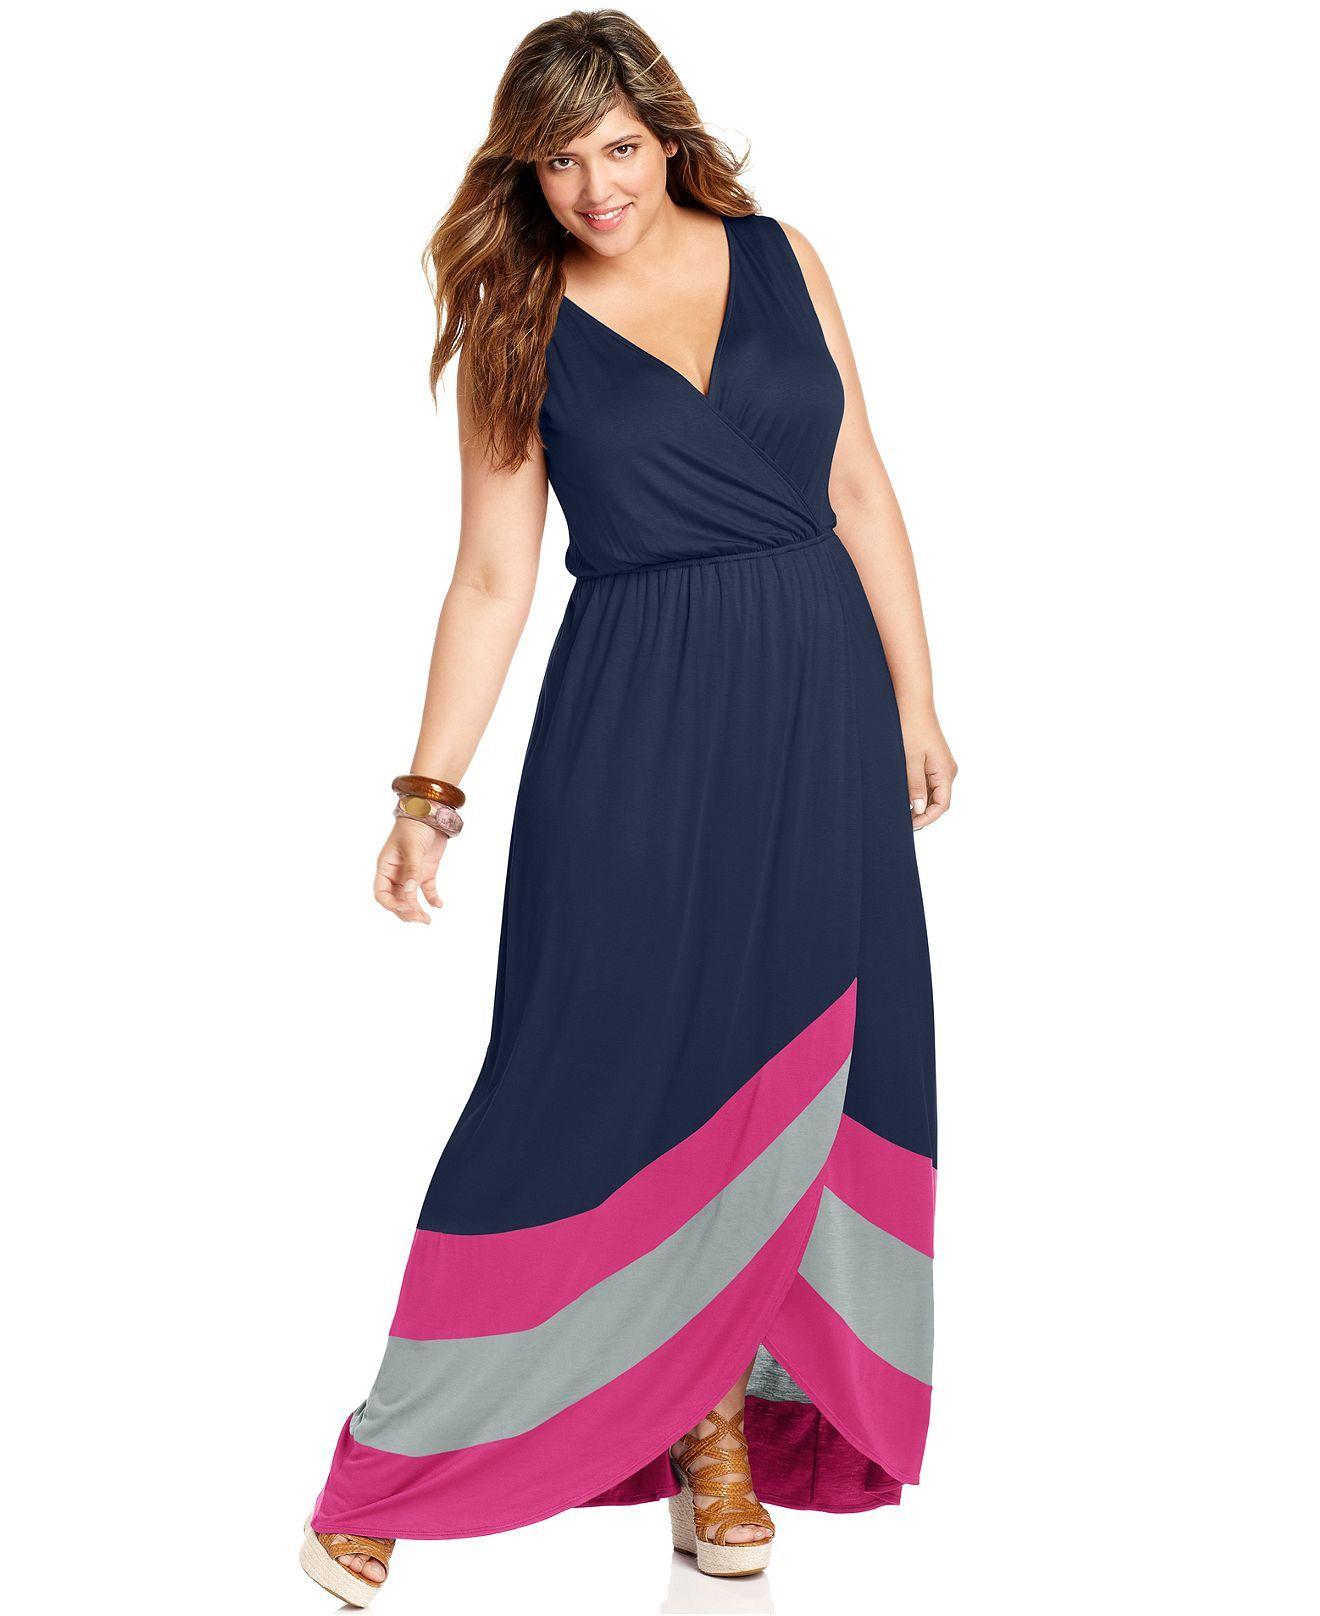 soprano plus size dress, sleeveless colorblocked maxi - plus size